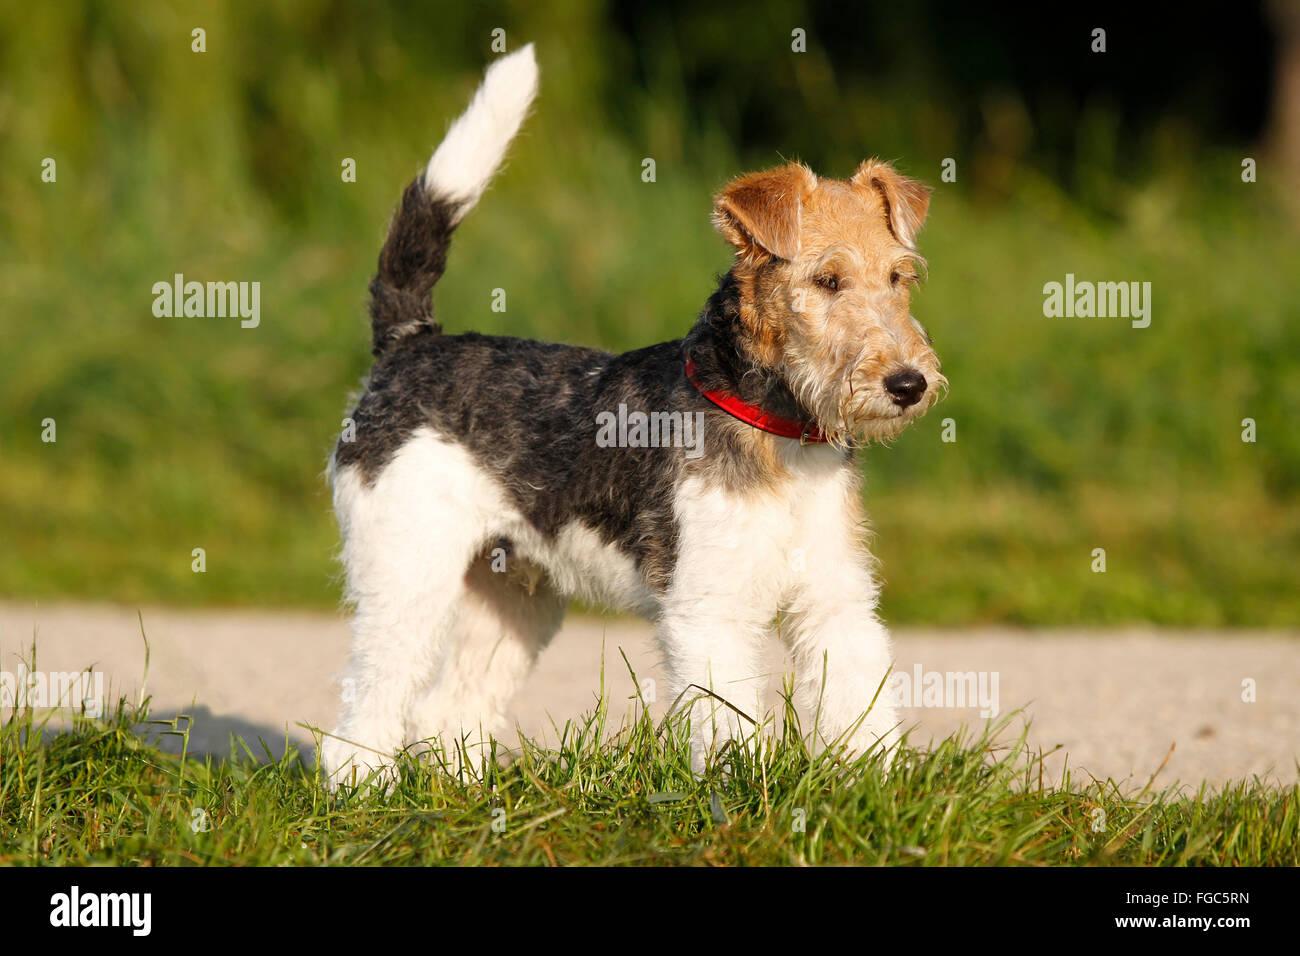 A Fox Terrier Stockfotos & A Fox Terrier Bilder - Seite 3 - Alamy